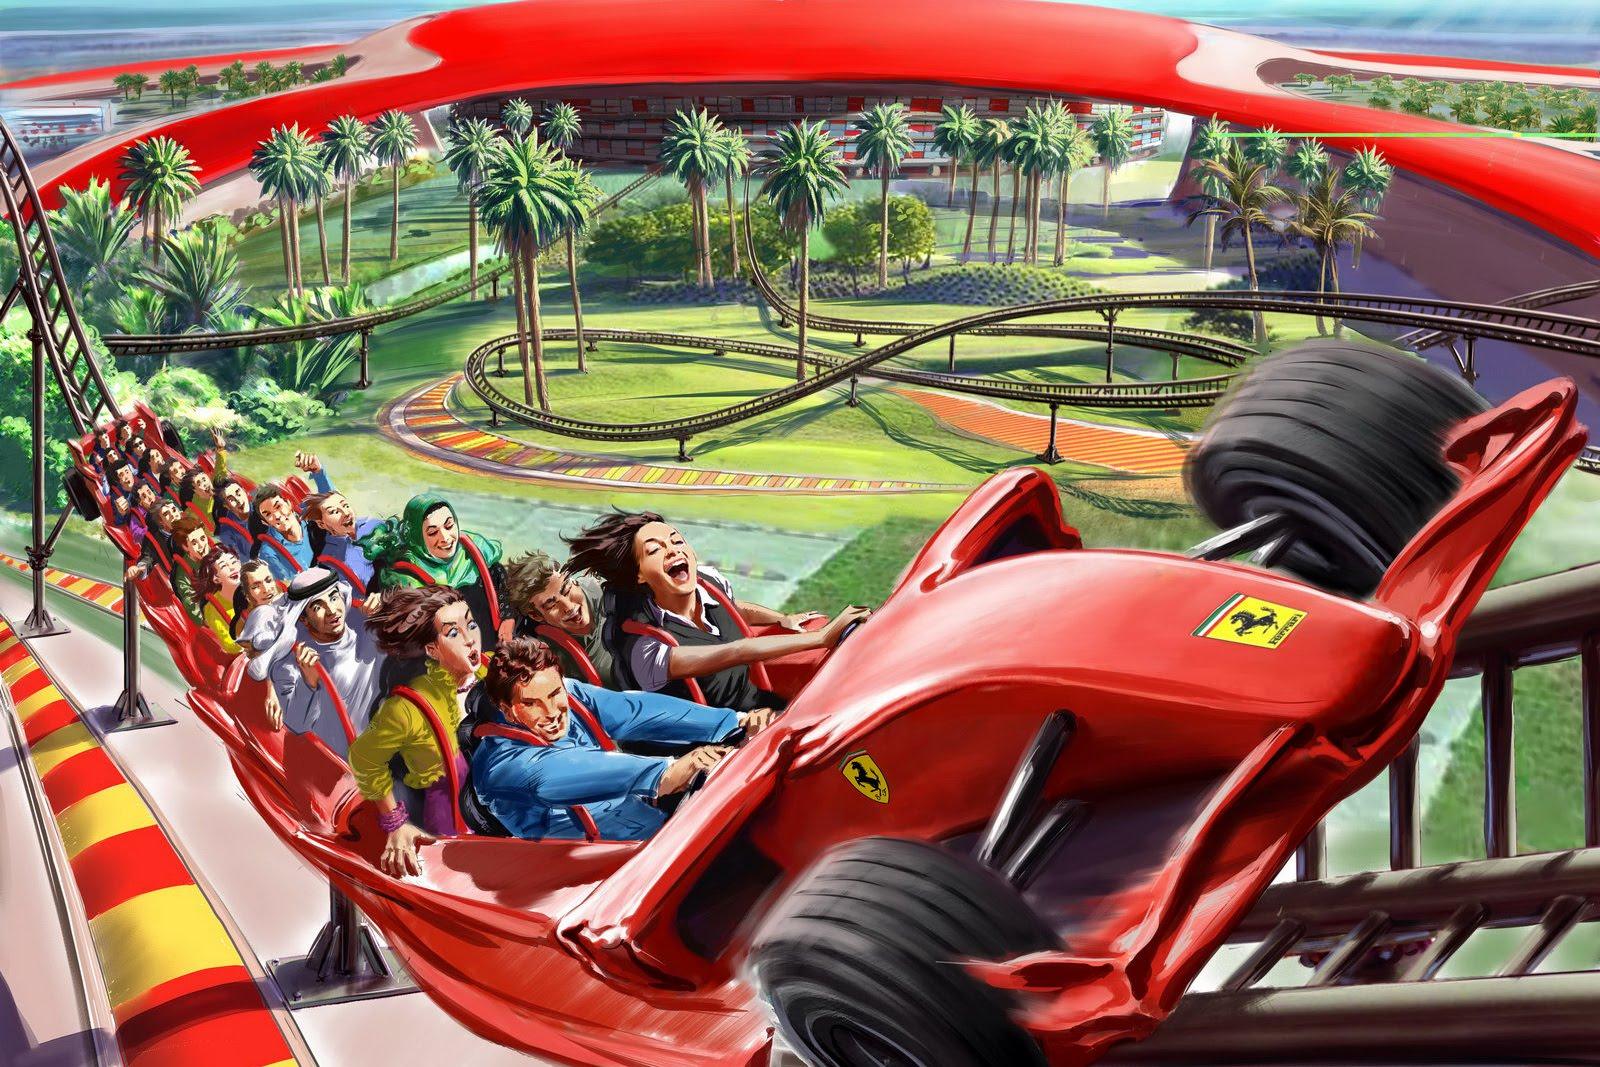 Abu Dhabi Ferrari World Roller Coaster 2015 Best Auto